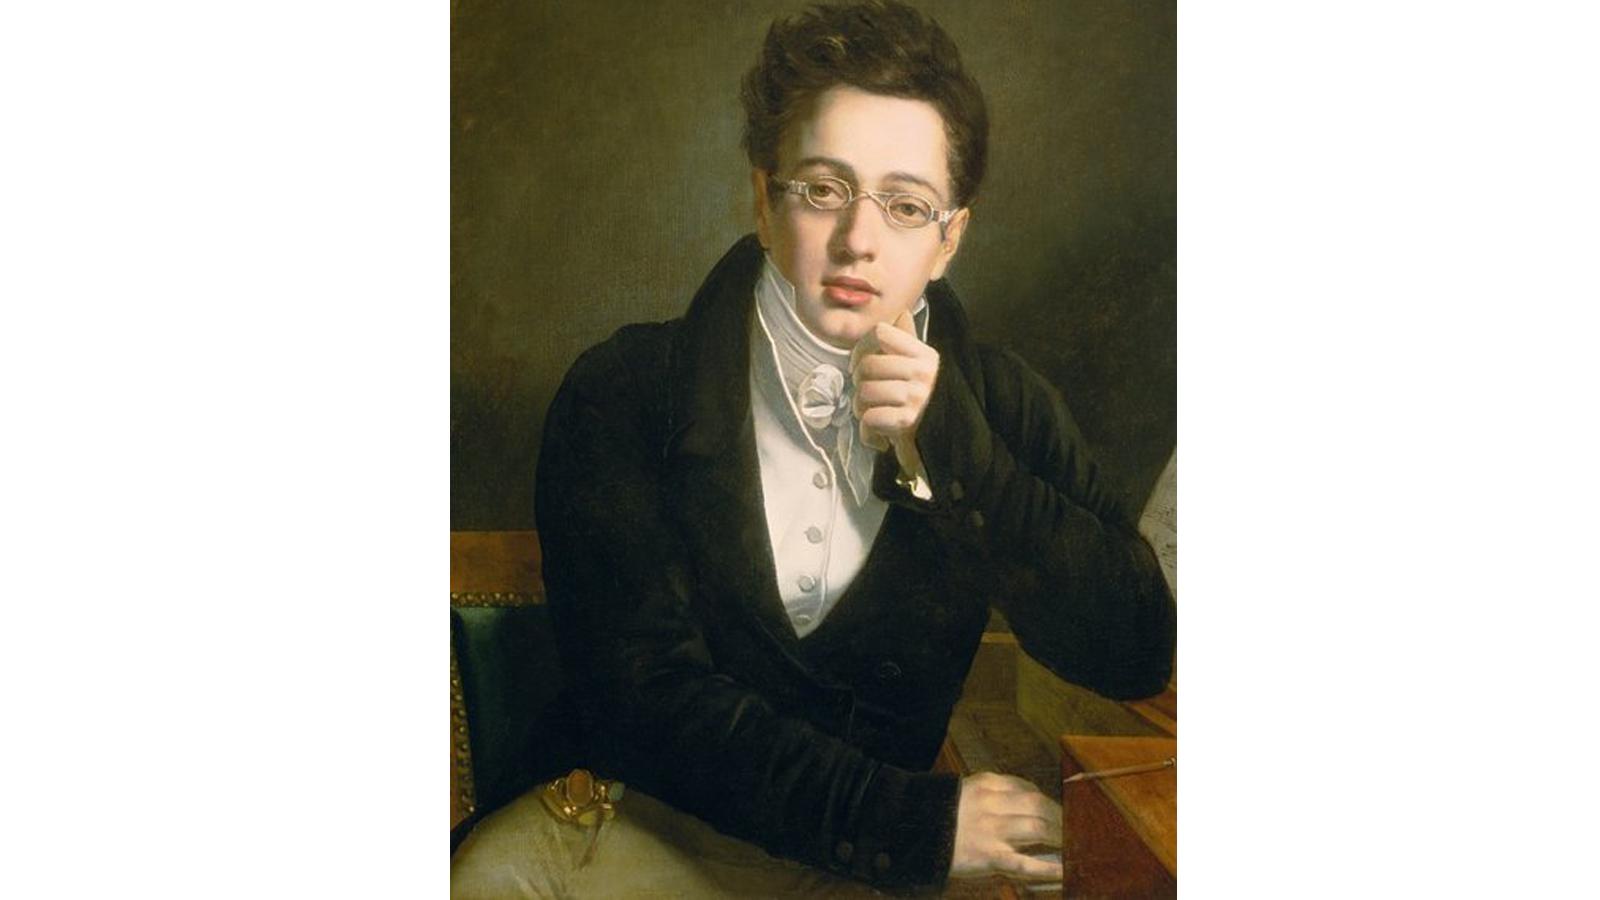 <b>Schubert</b>